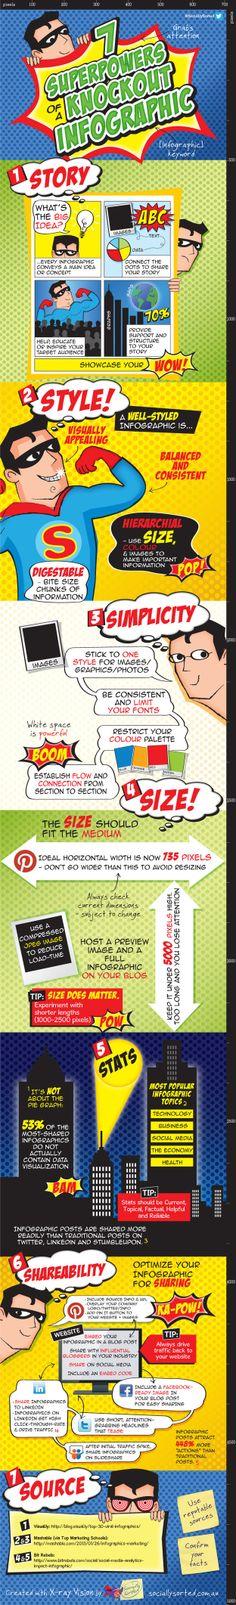 i 7 Segreti per una #infografica efficace